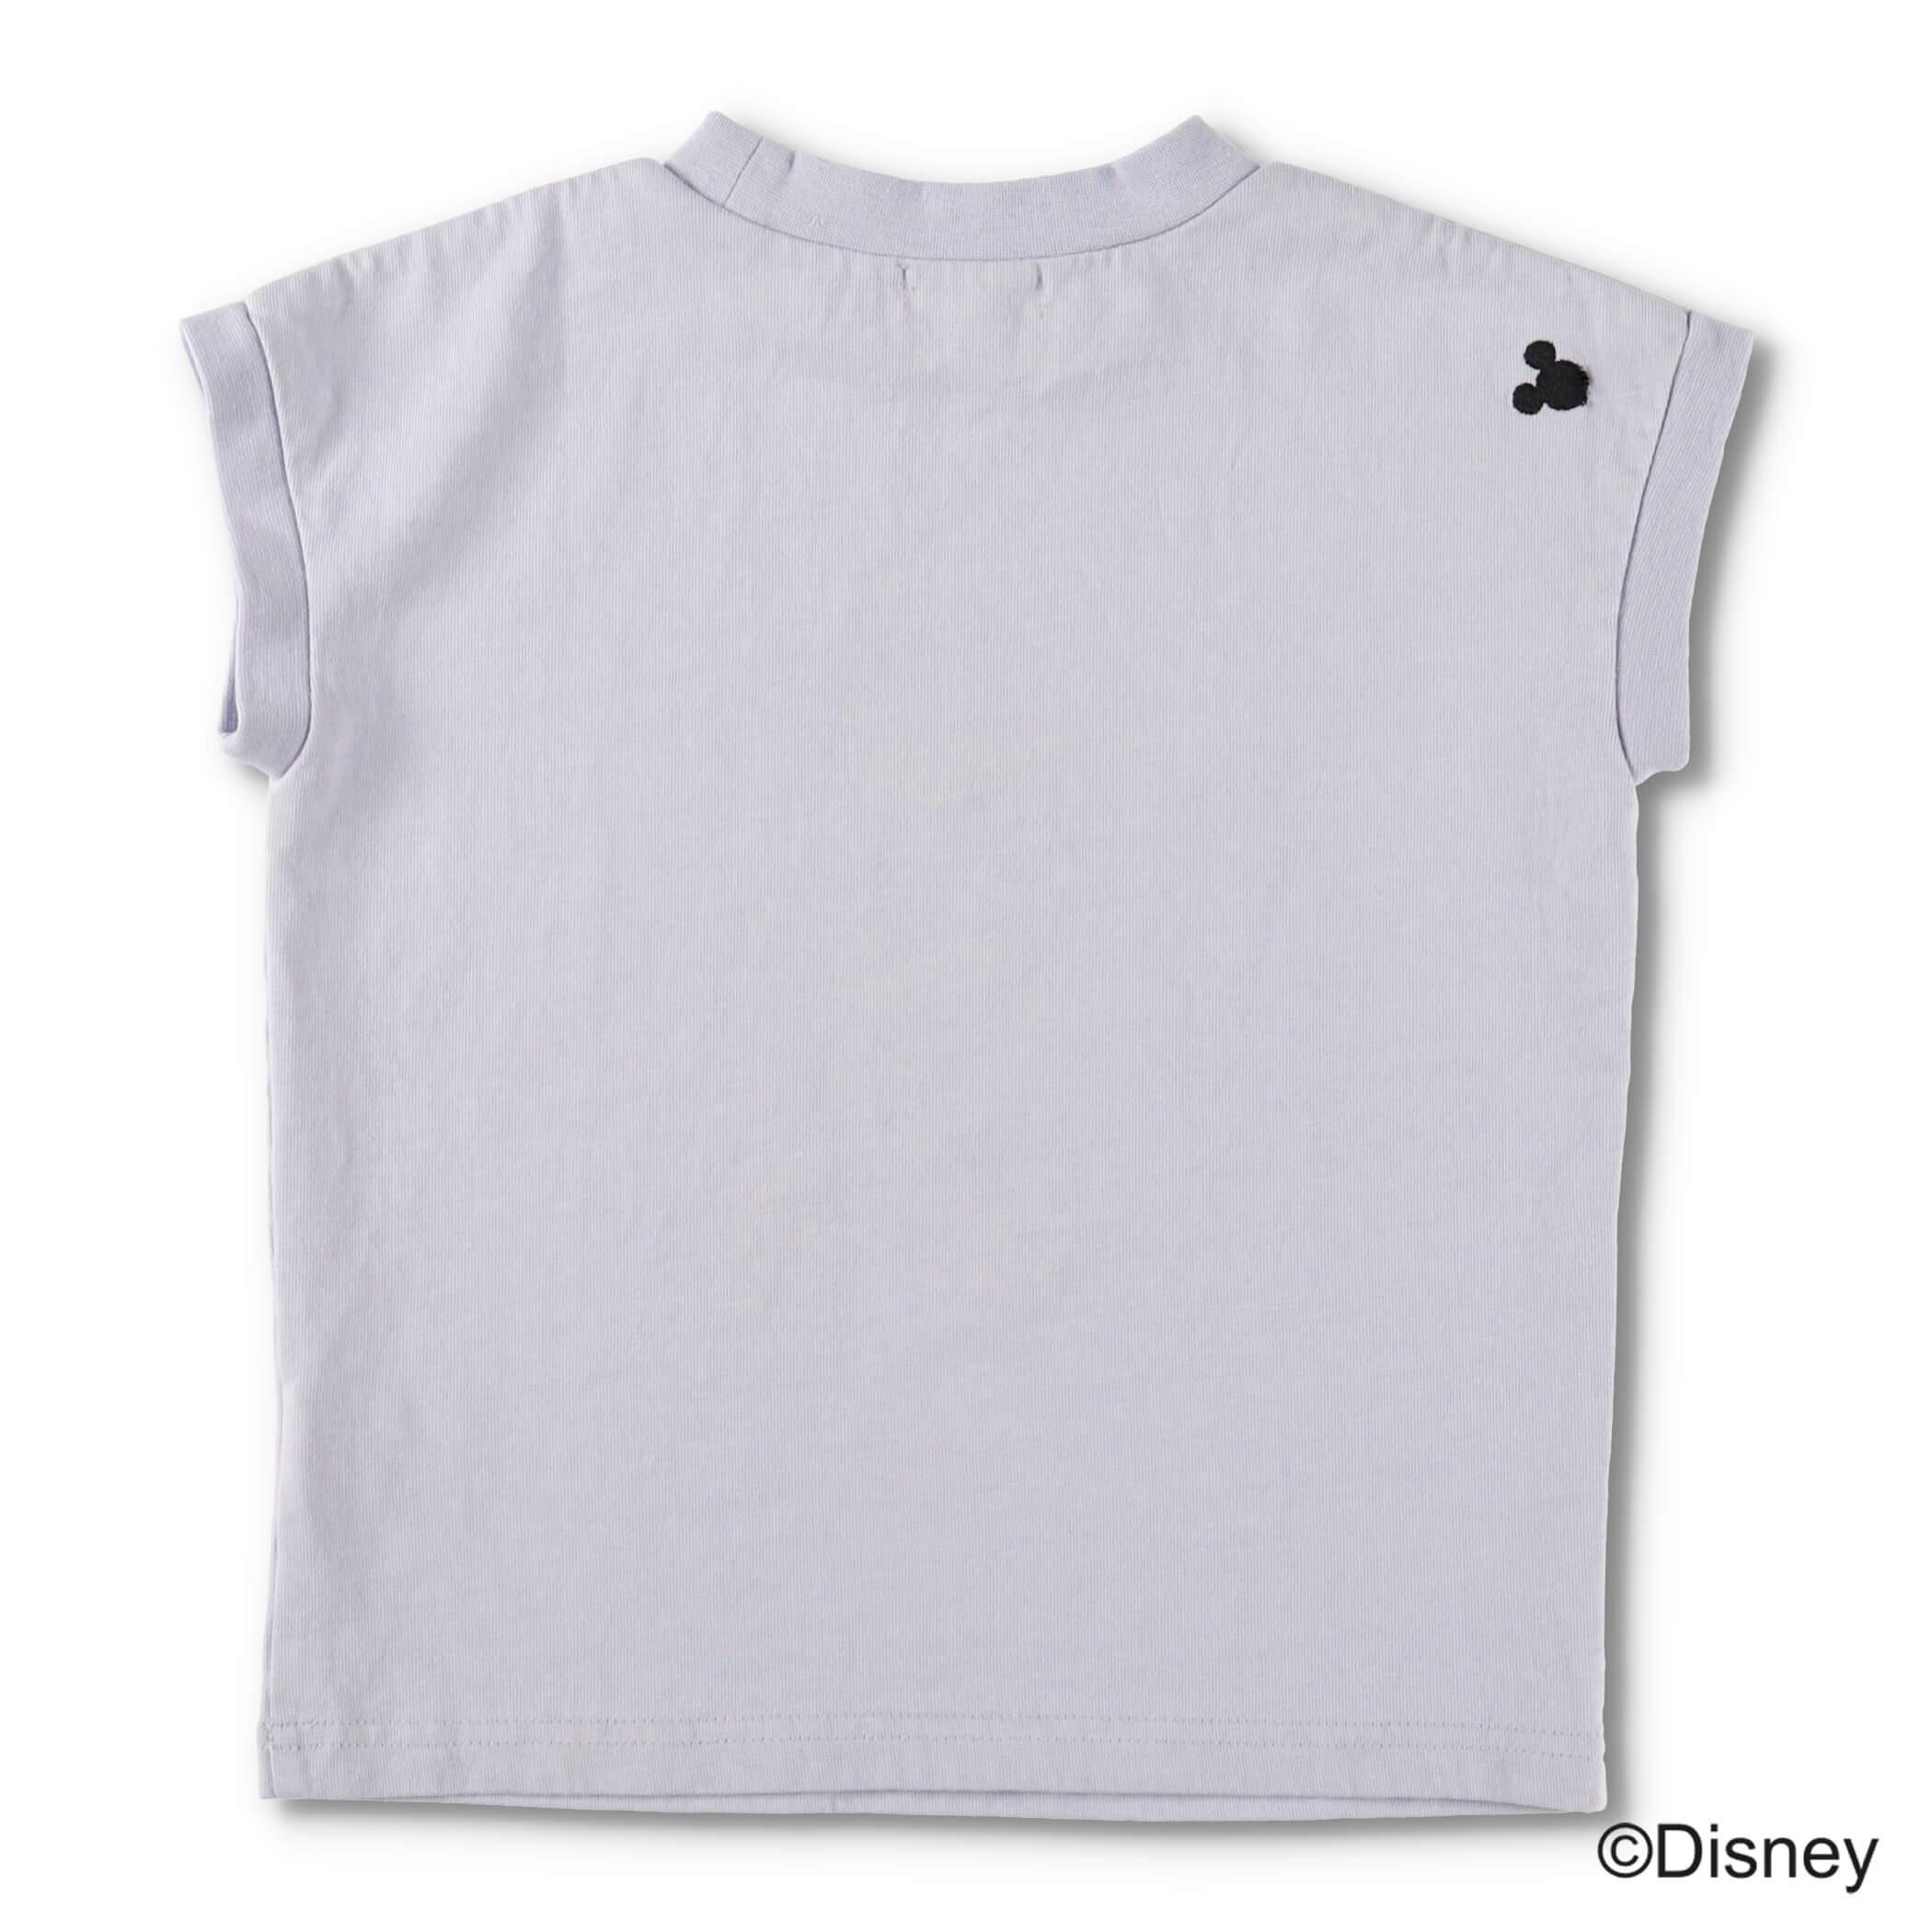 【Disney】フレンチスリーブTシャツト